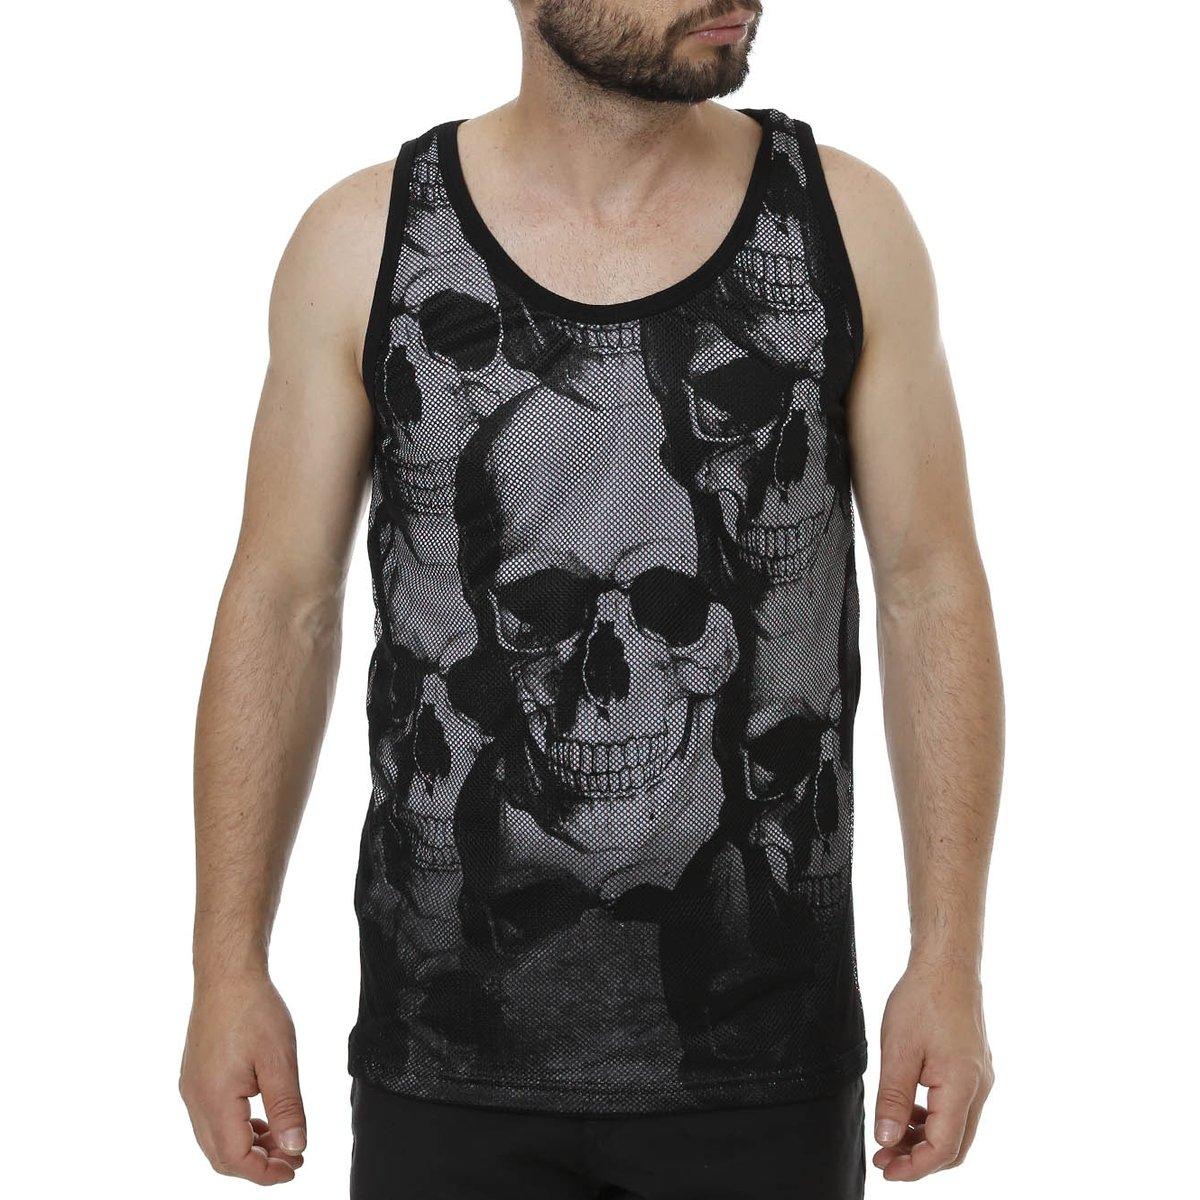 3840cca4dc Camiseta Regata Masculina Local - Compre Agora